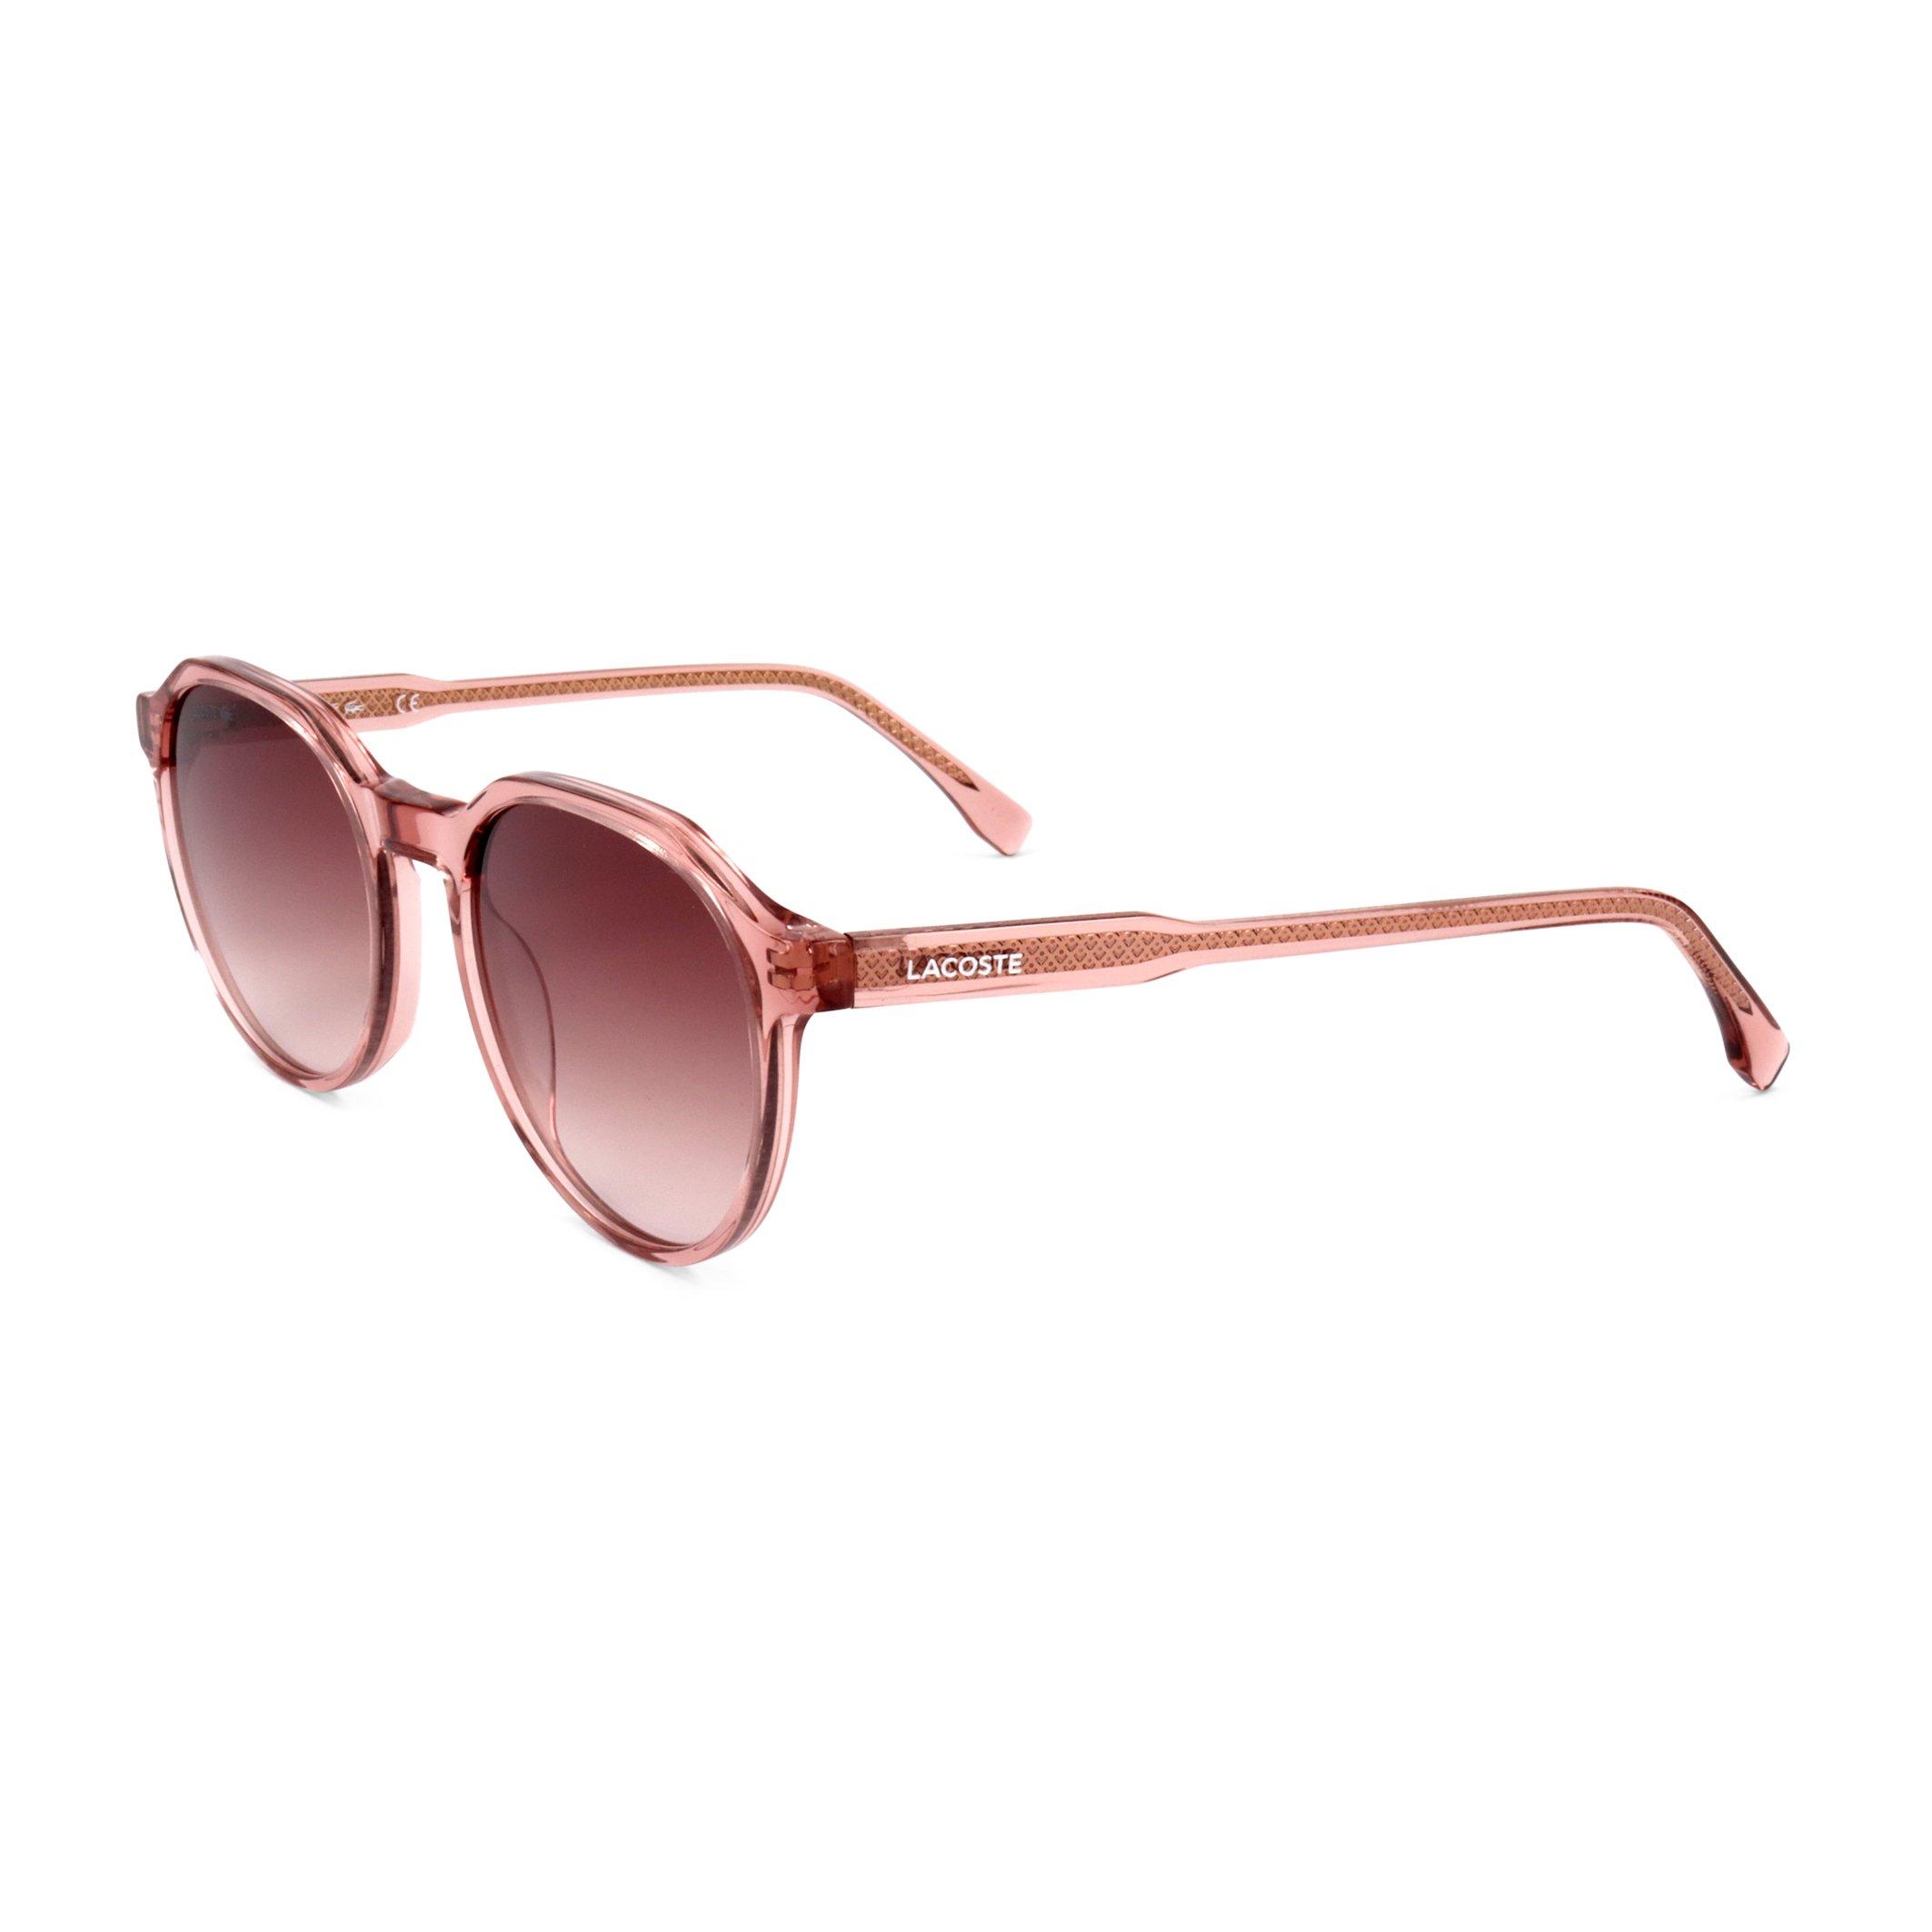 Lacoste Women's Sunglasses Grey L909S - pink NOSIZE